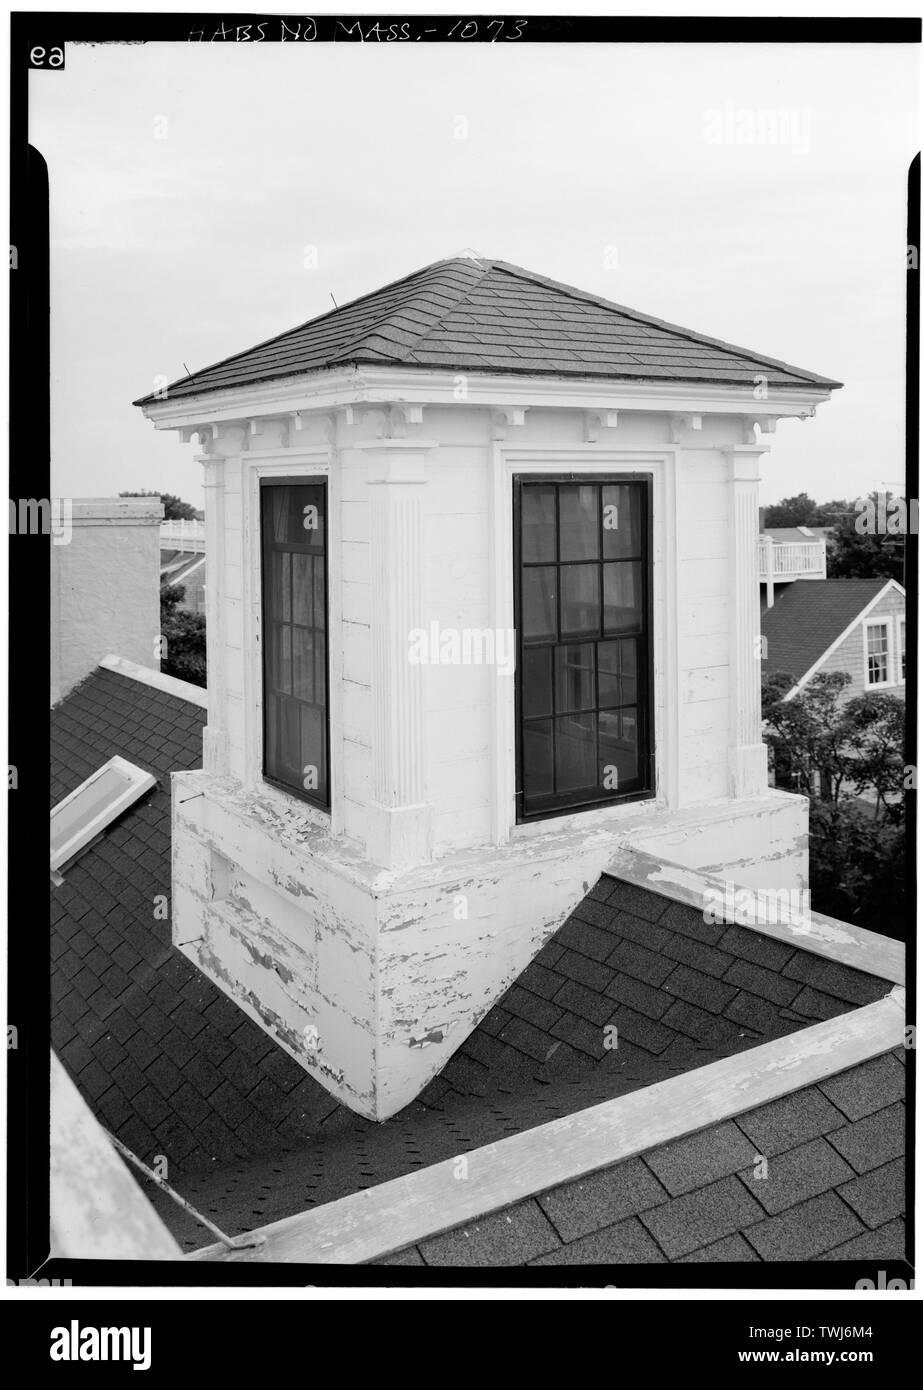 September, 1968 CUPOLA - Tupper-Folger House, 28 Orange Street, Nantucket, Nantucket County, MA - Stock Image